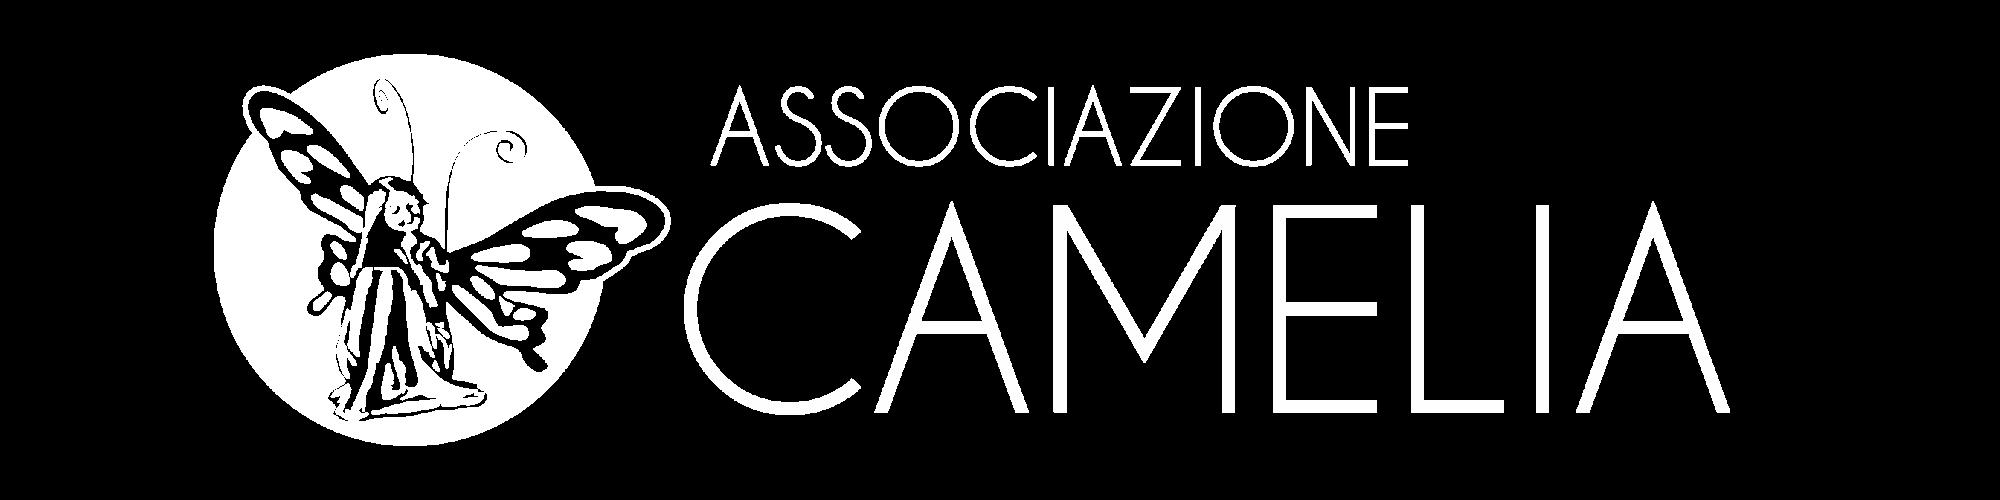 Associazione Camelia